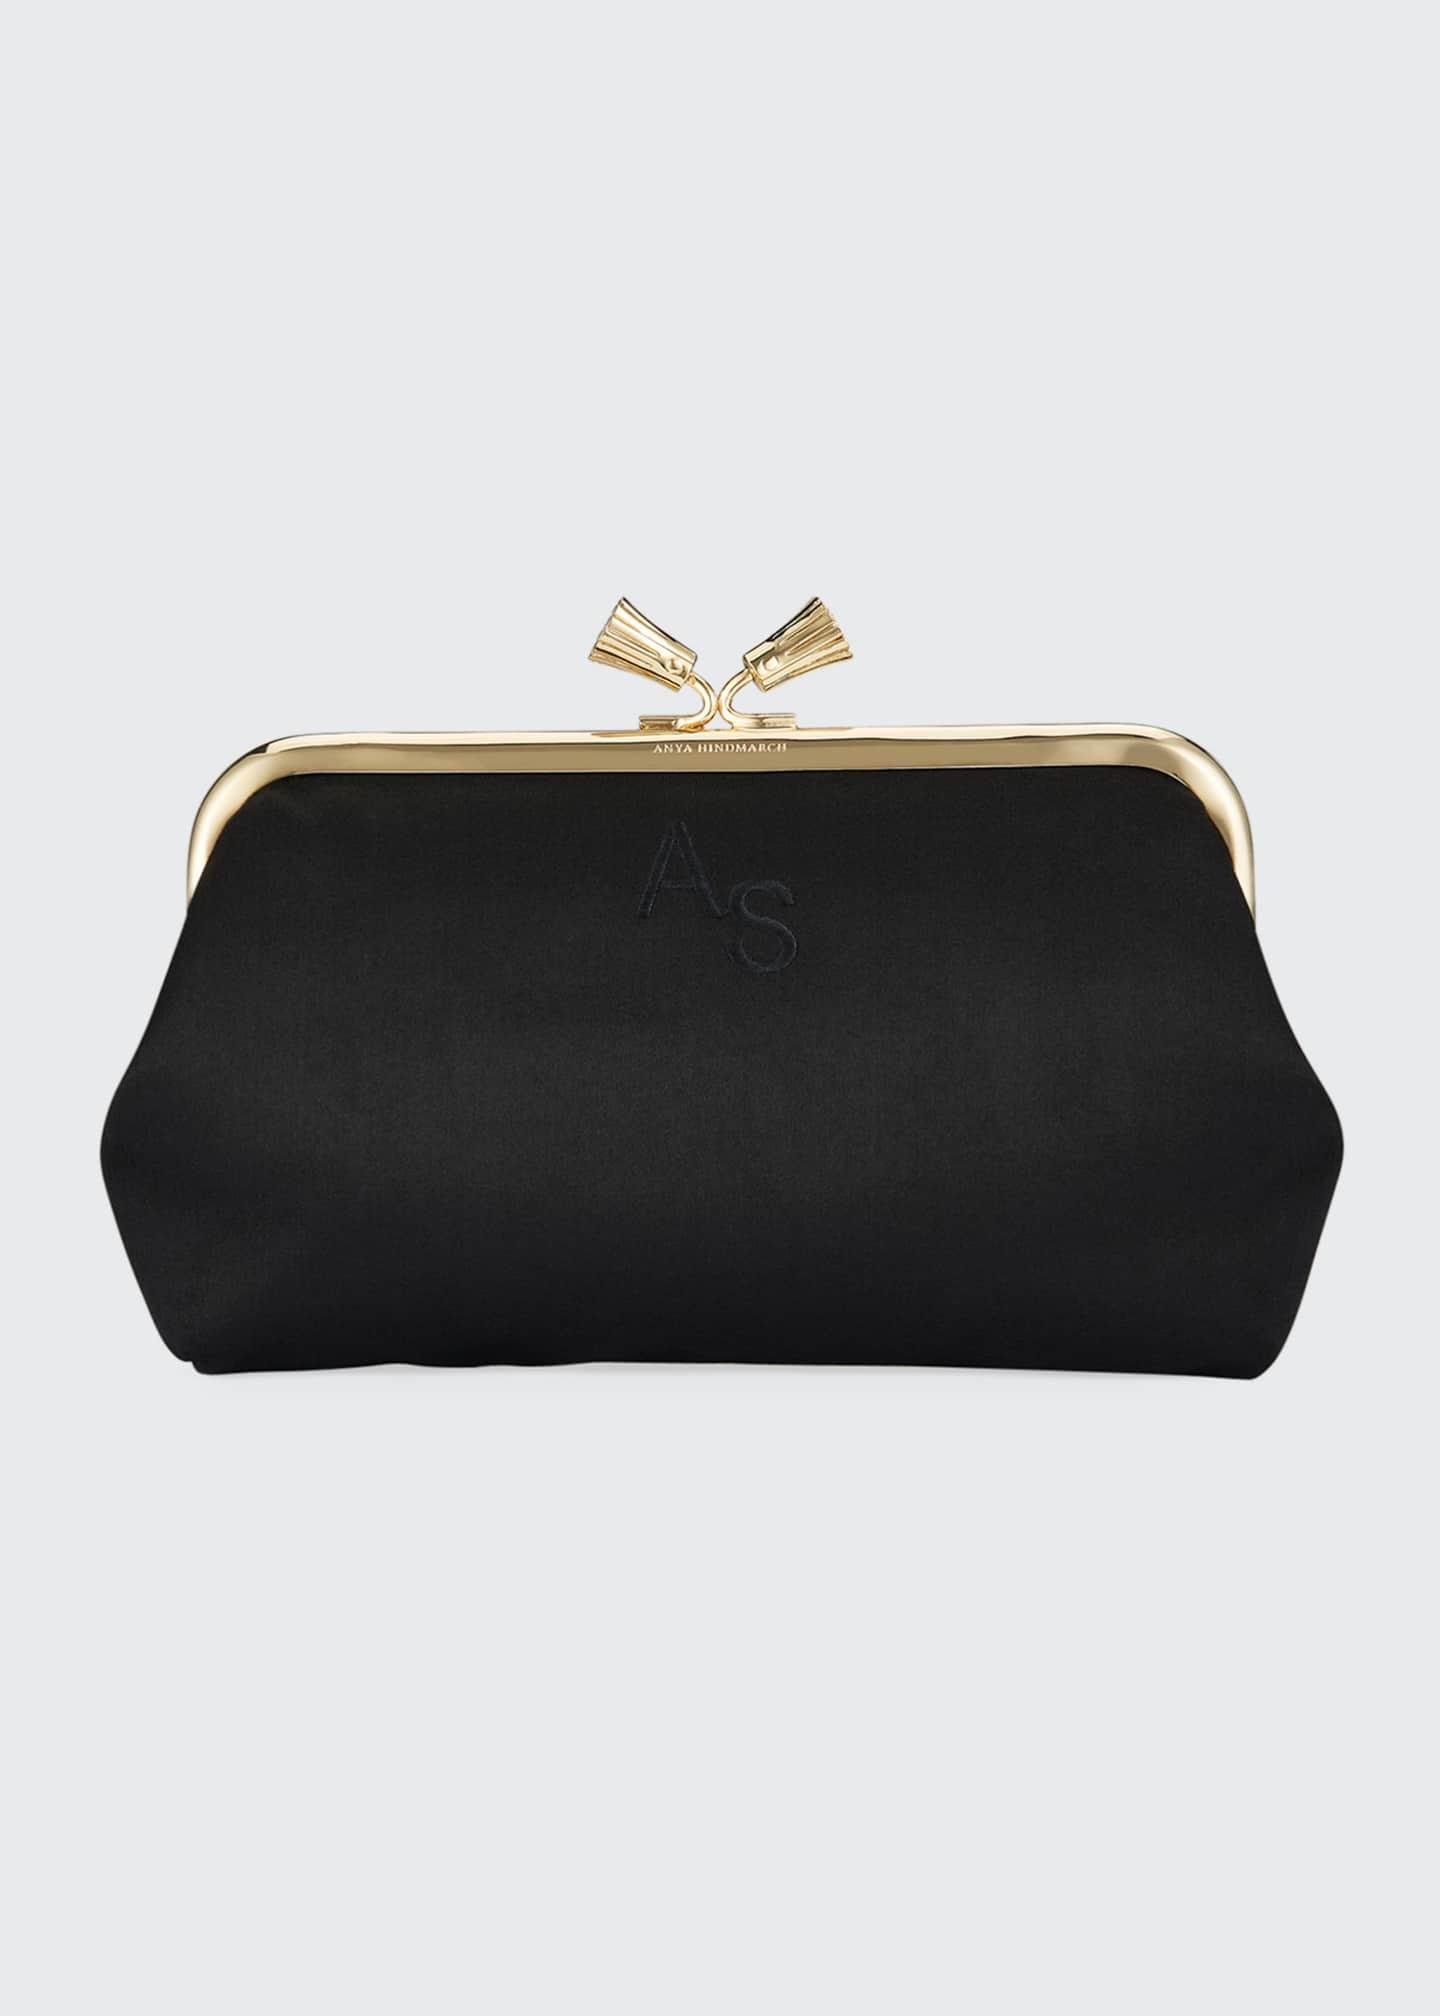 Anya Hindmarch Maud Tassel Satin Clutch Bag, Black